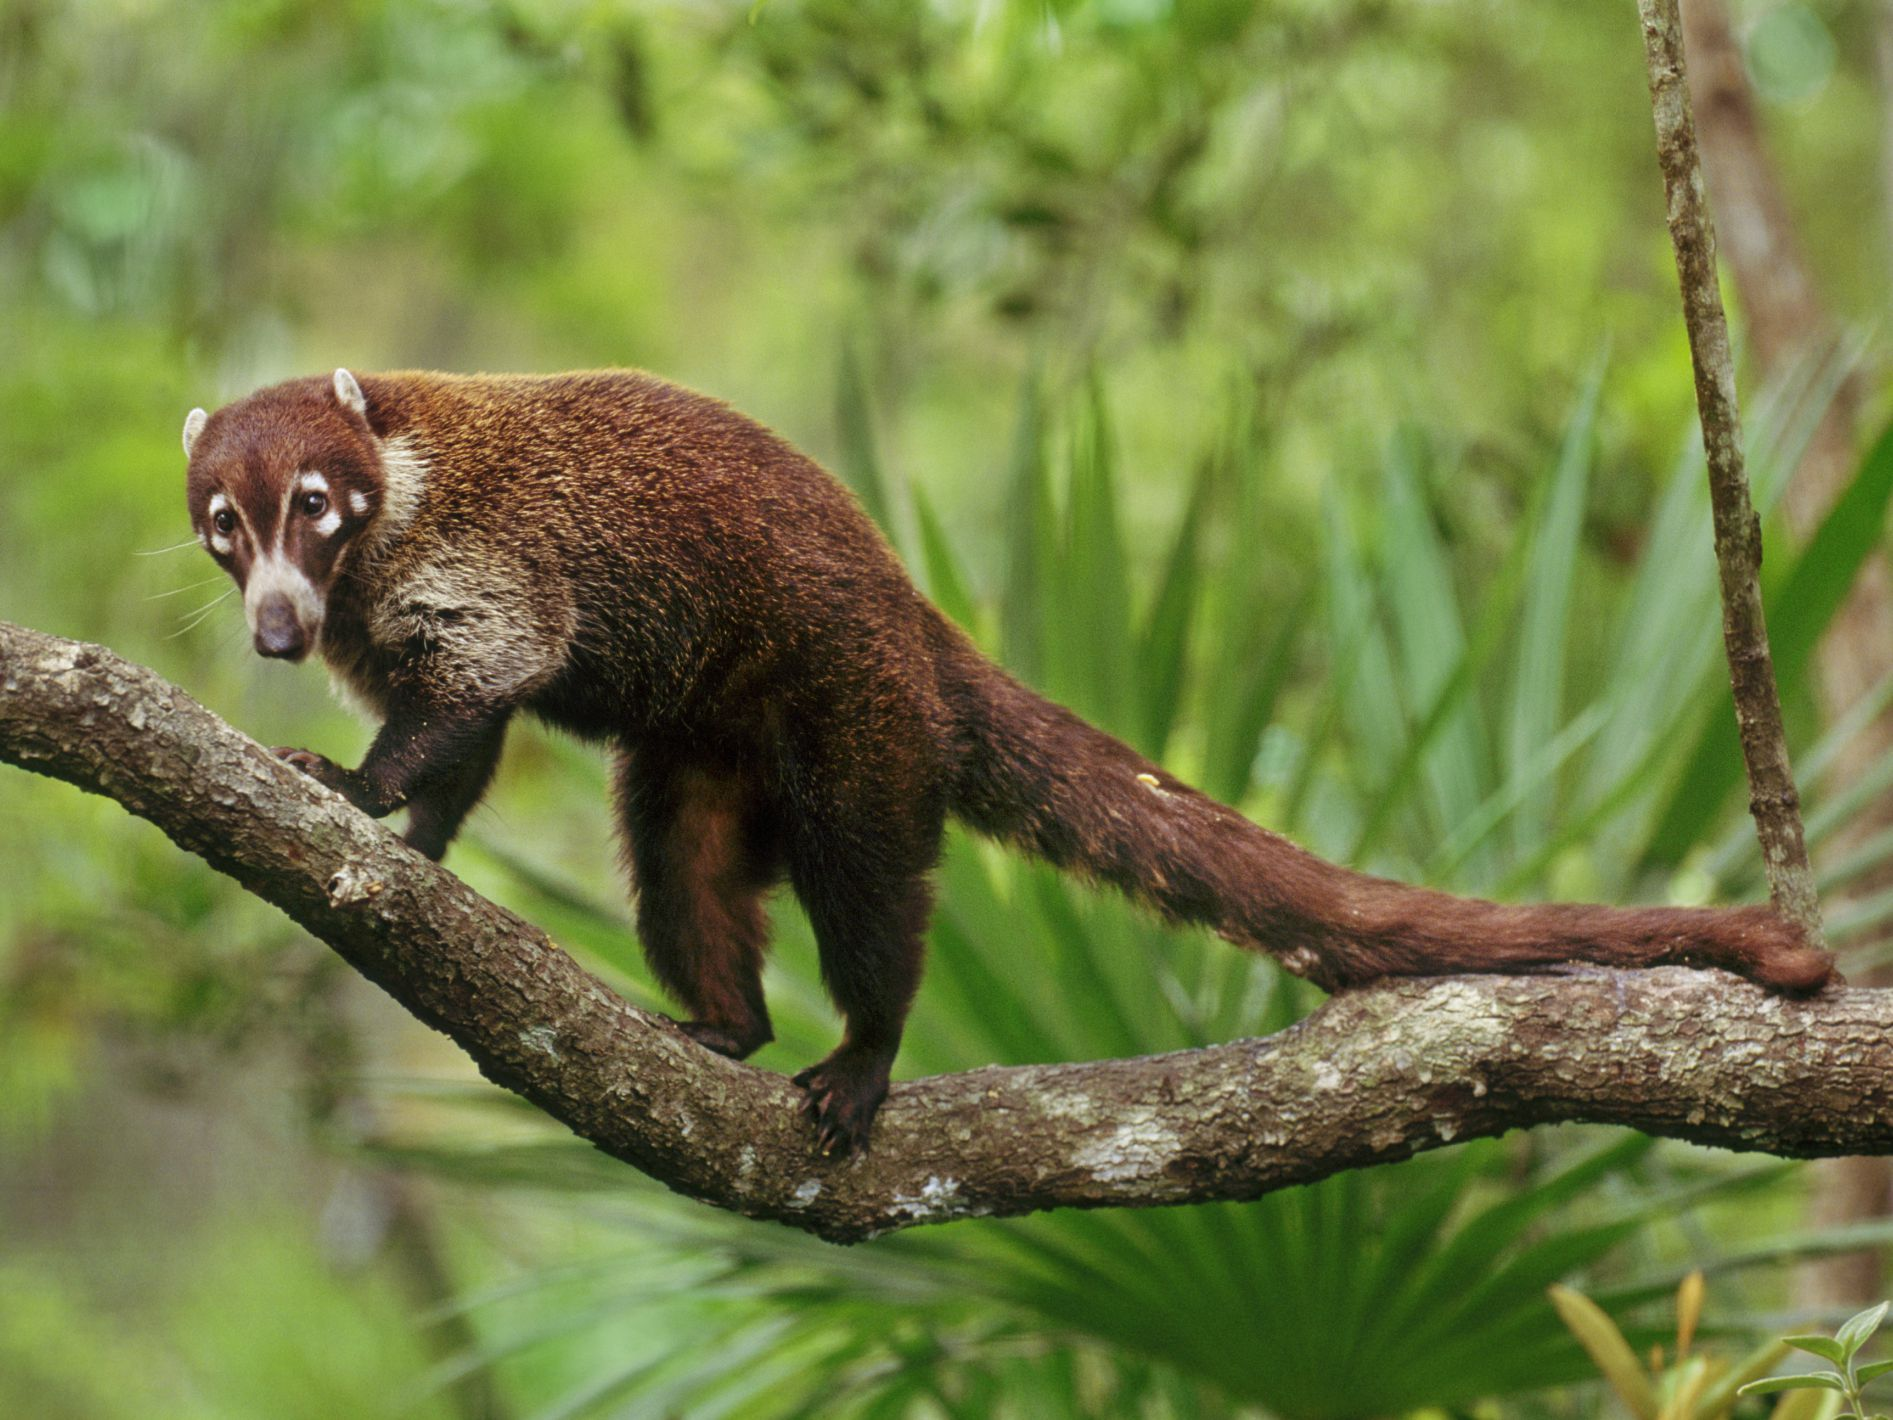 Keeping and Caring for a Pet Coatimundi (Coati)